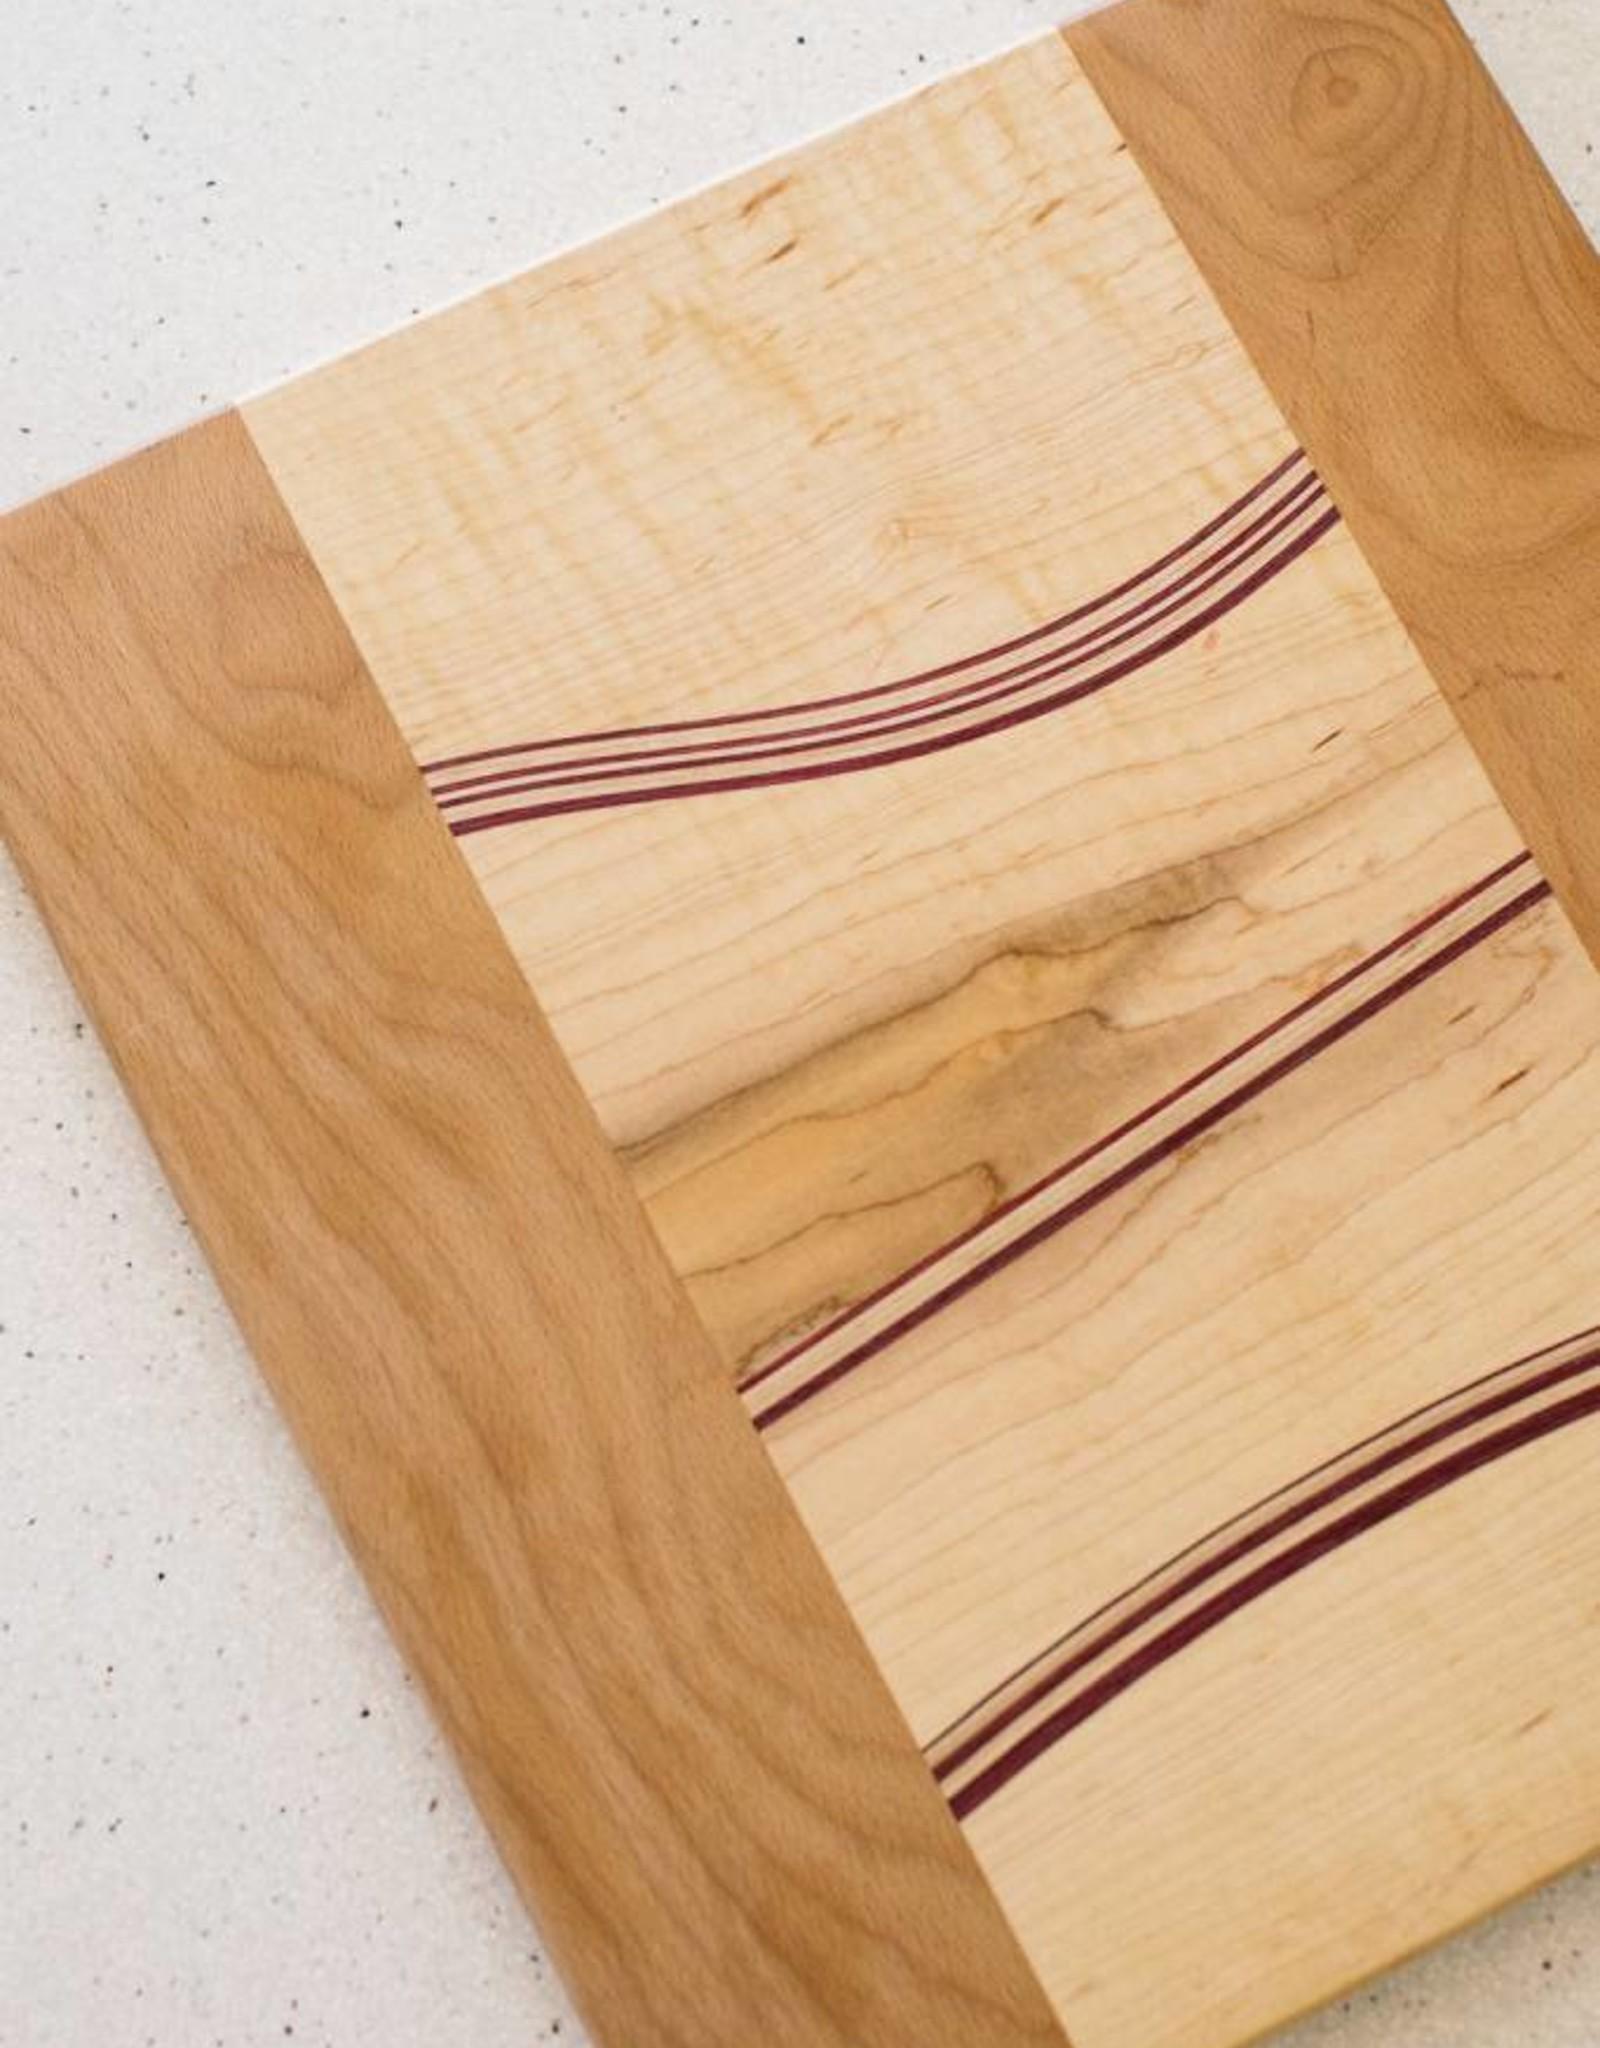 Server/Cutting Board #3